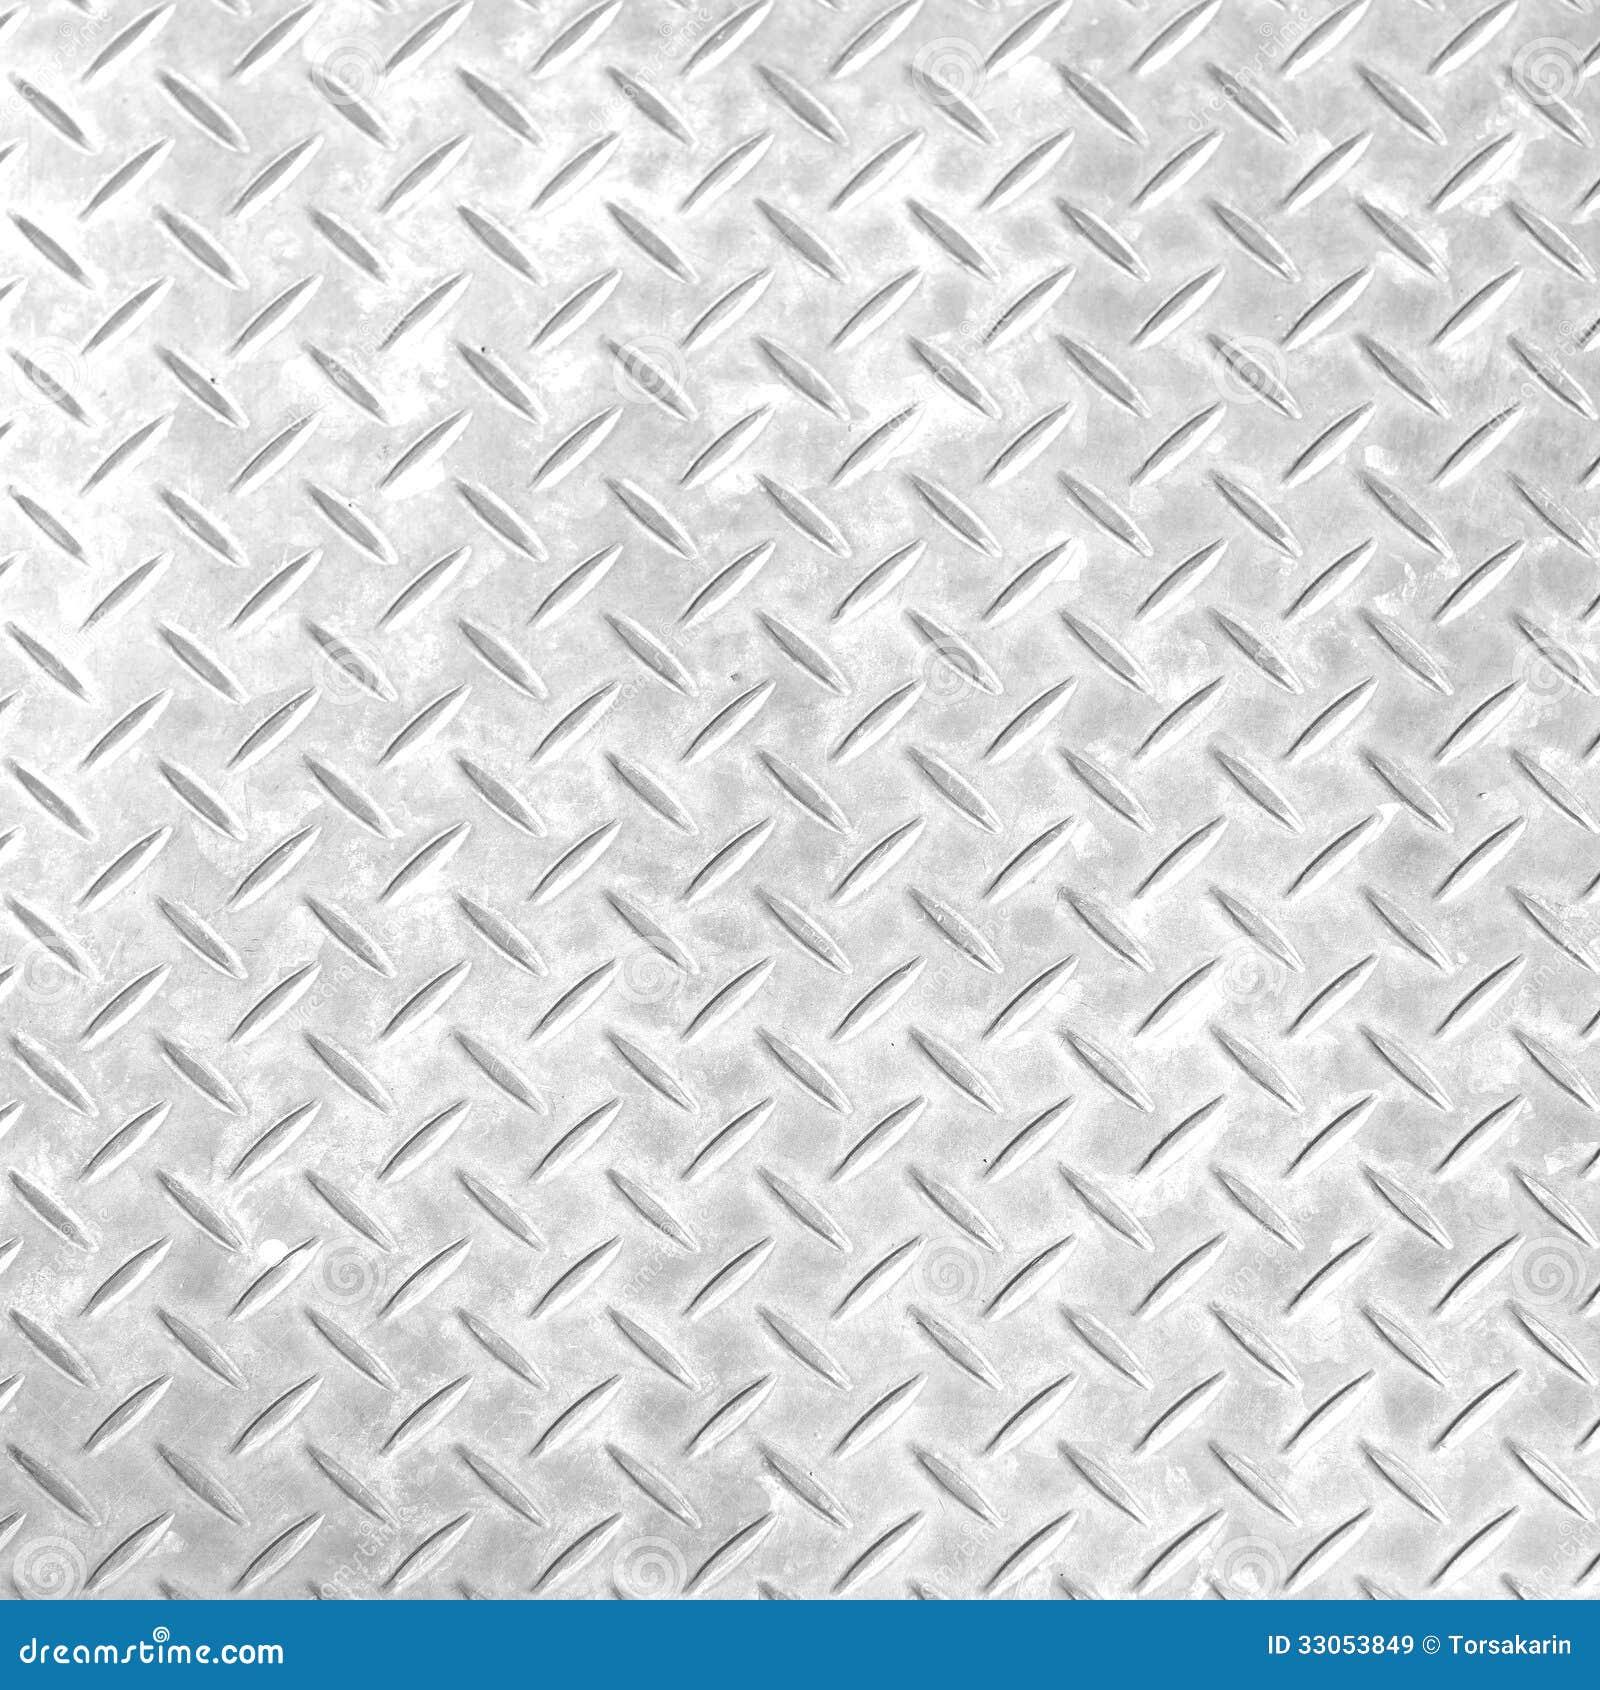 White Sheet Metal : Silver textured sheet metal texture picture free